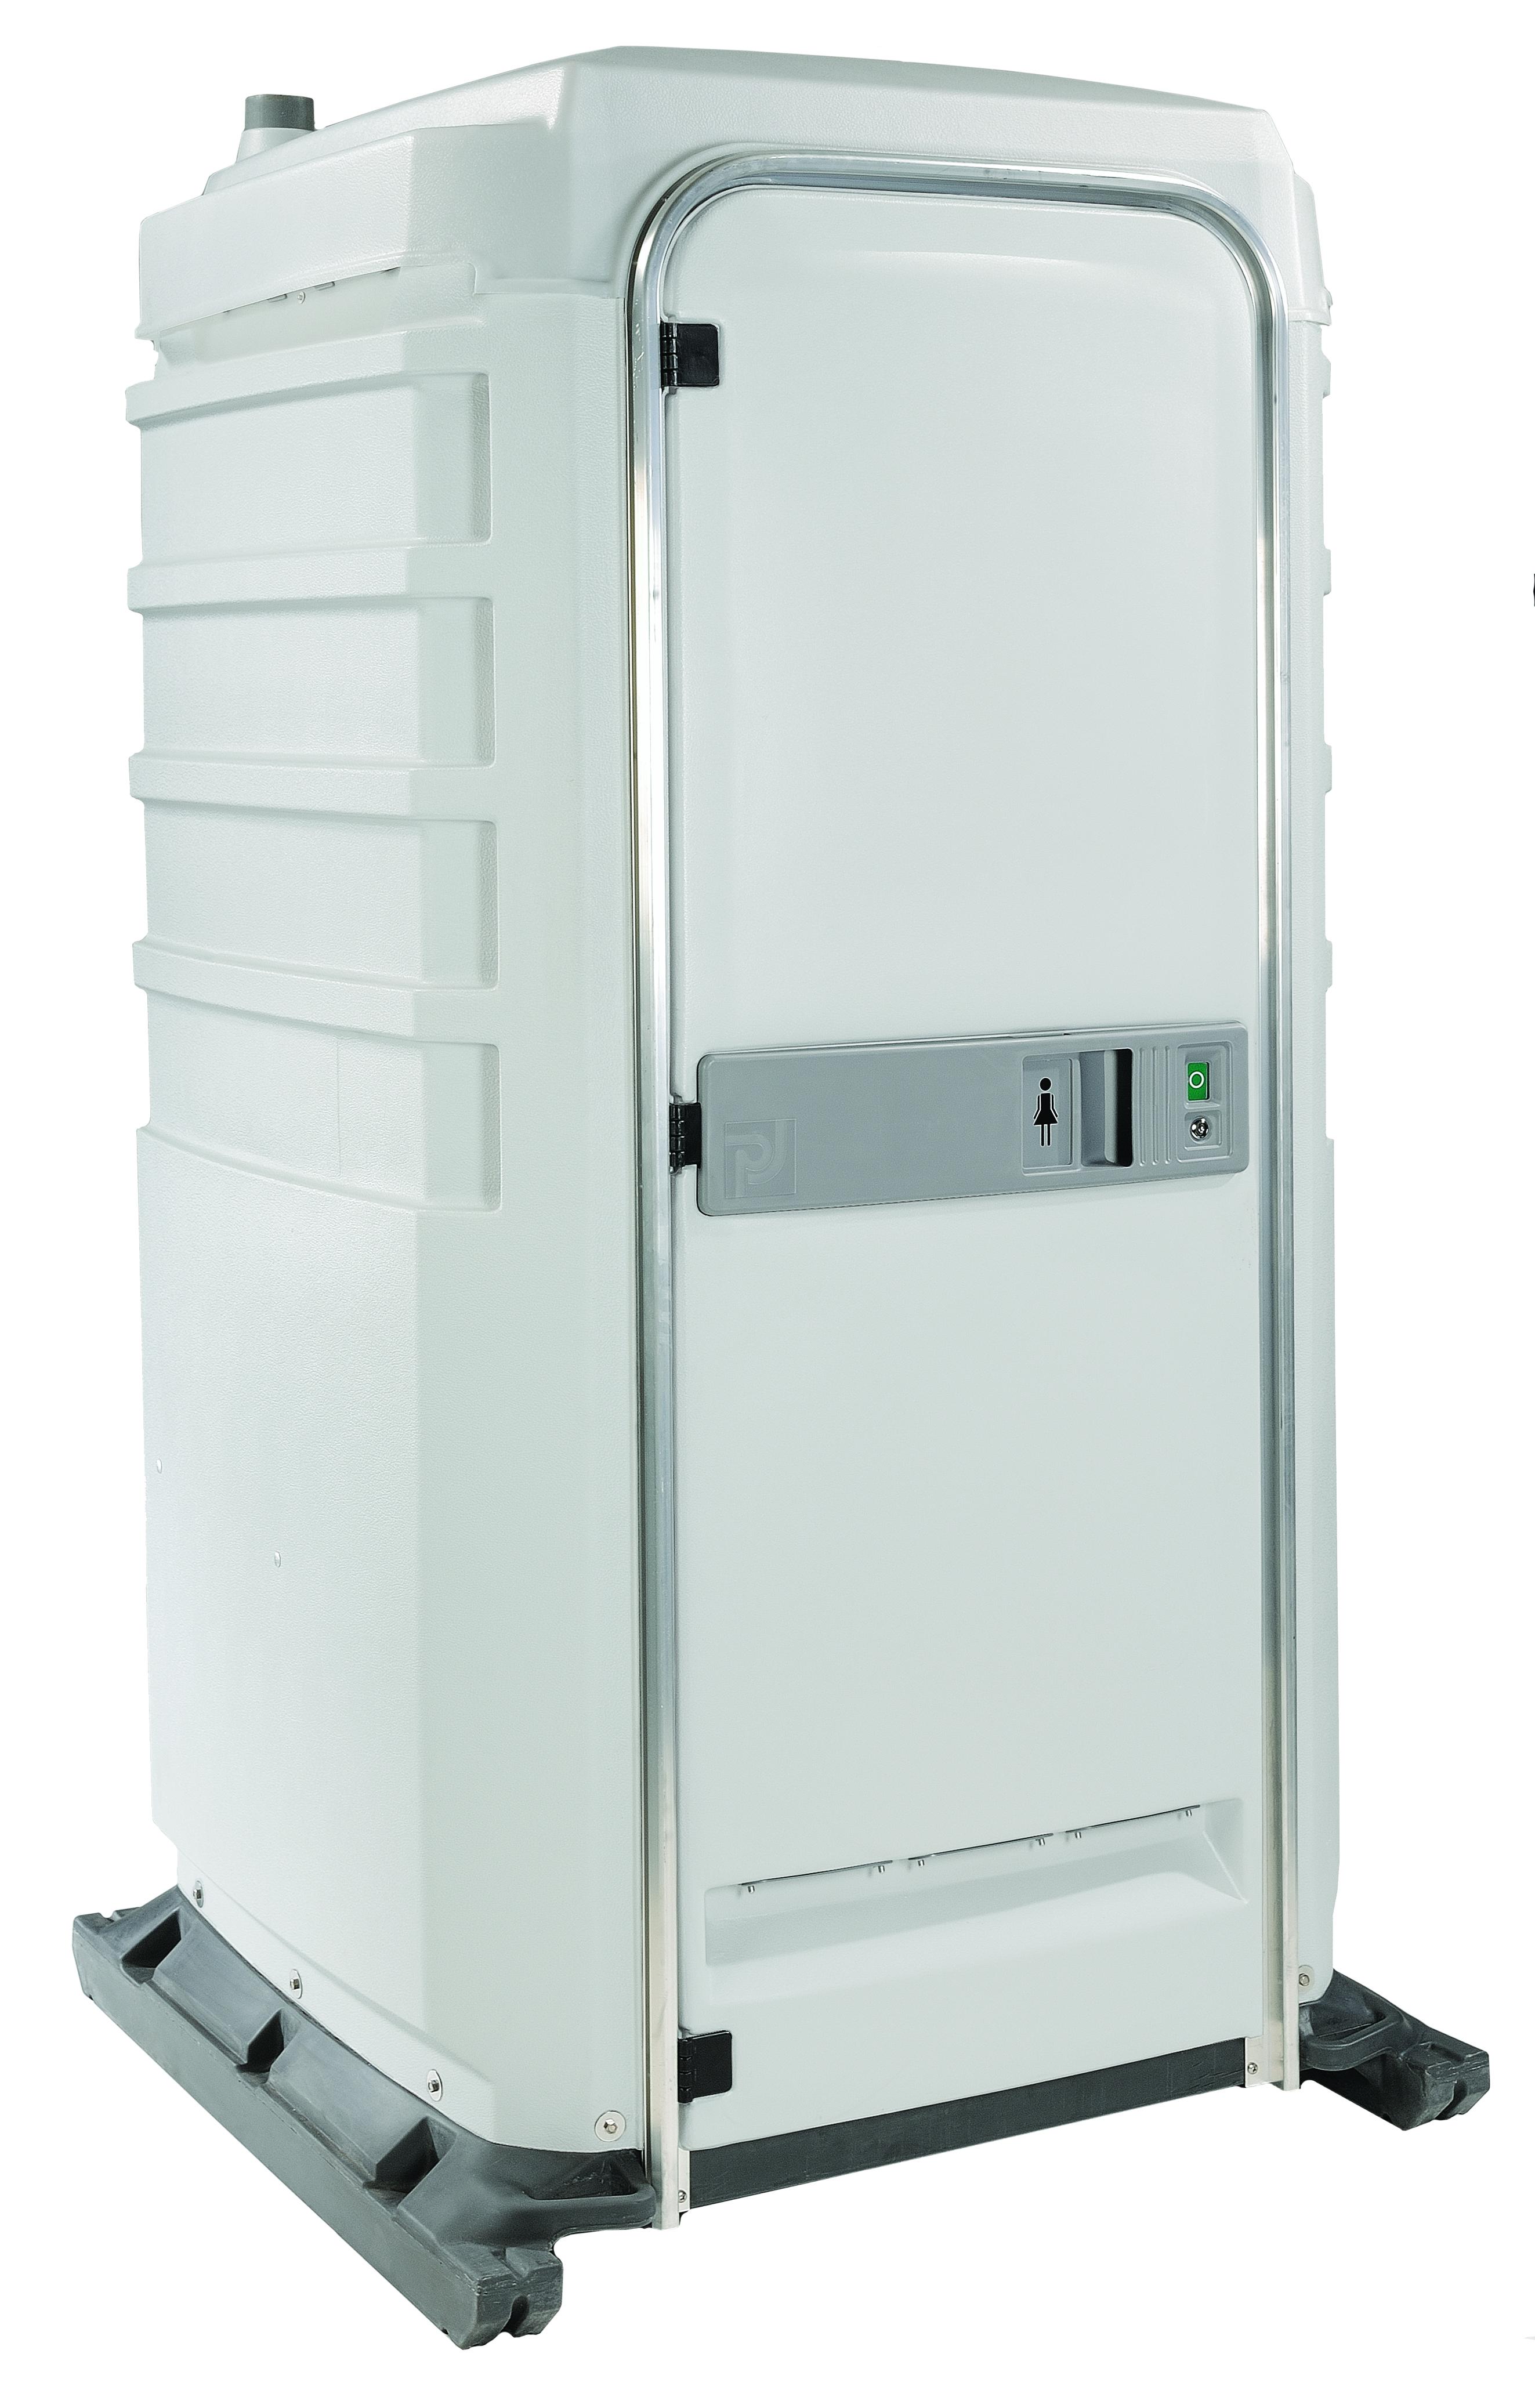 Portable Flushing Porta Potty Rental